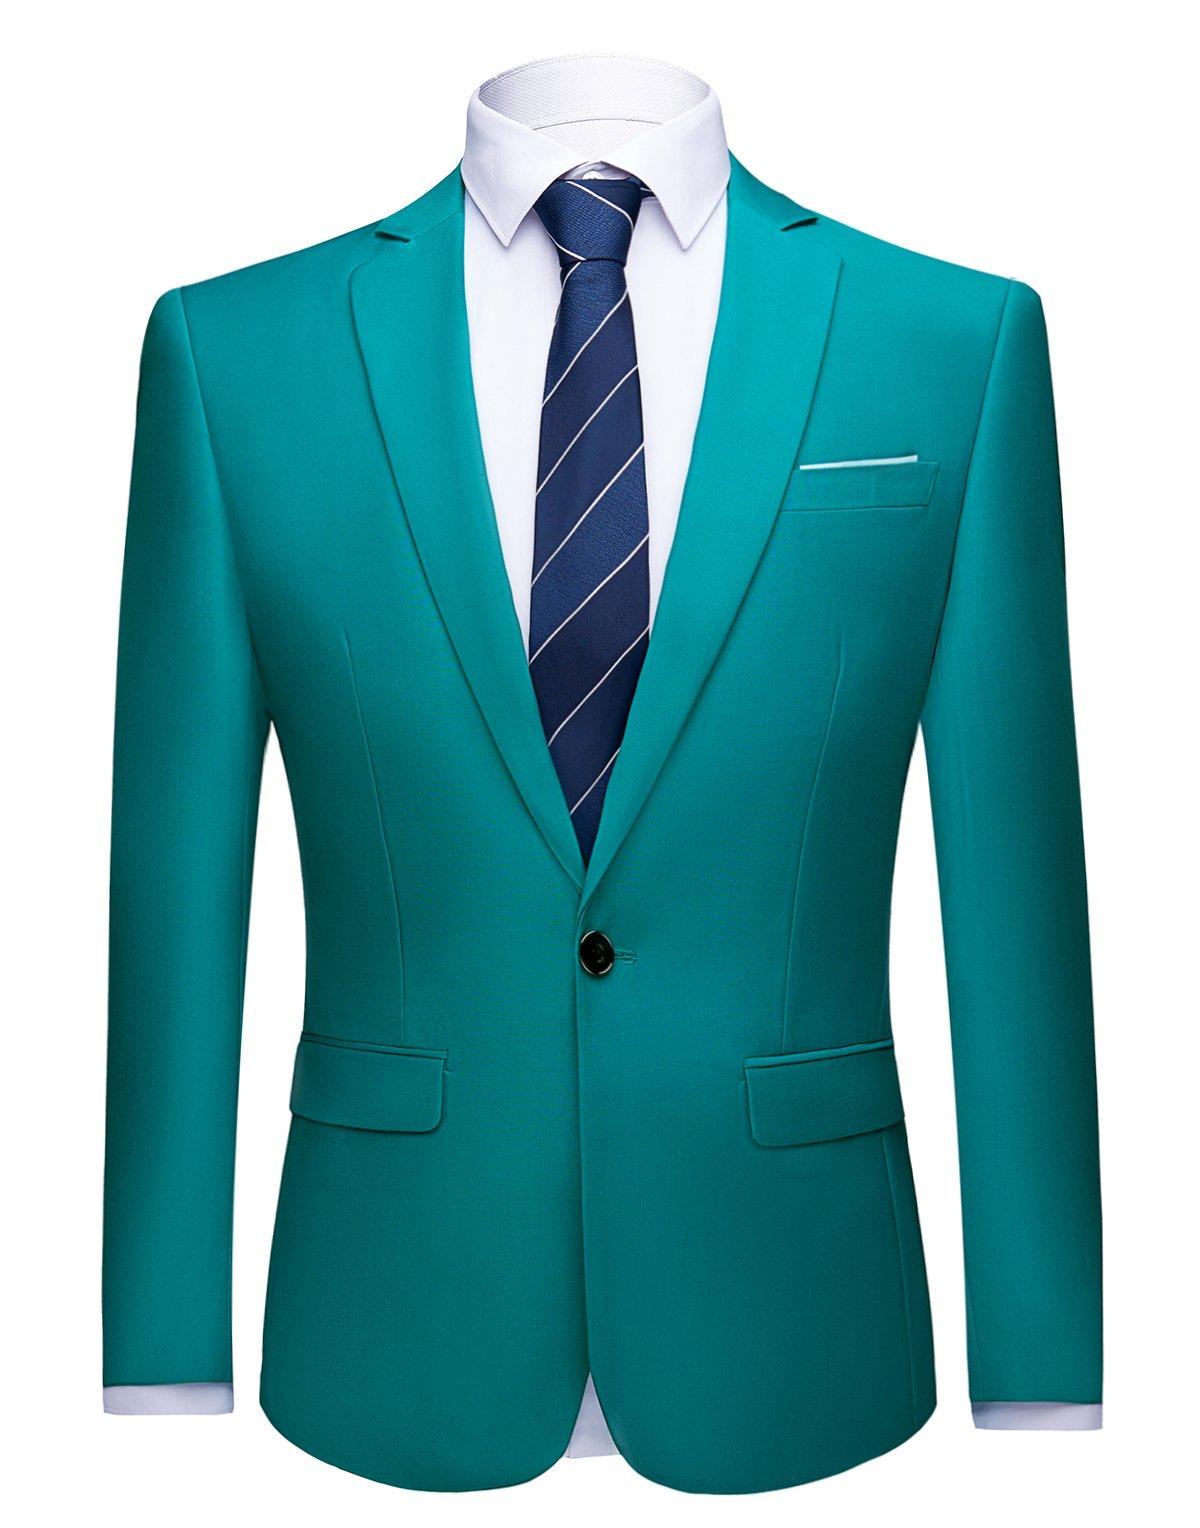 WULFUL Men's Suit Blazer Slim Fit One Button Casual Formal Suit Jacket Wedding Tuxedo